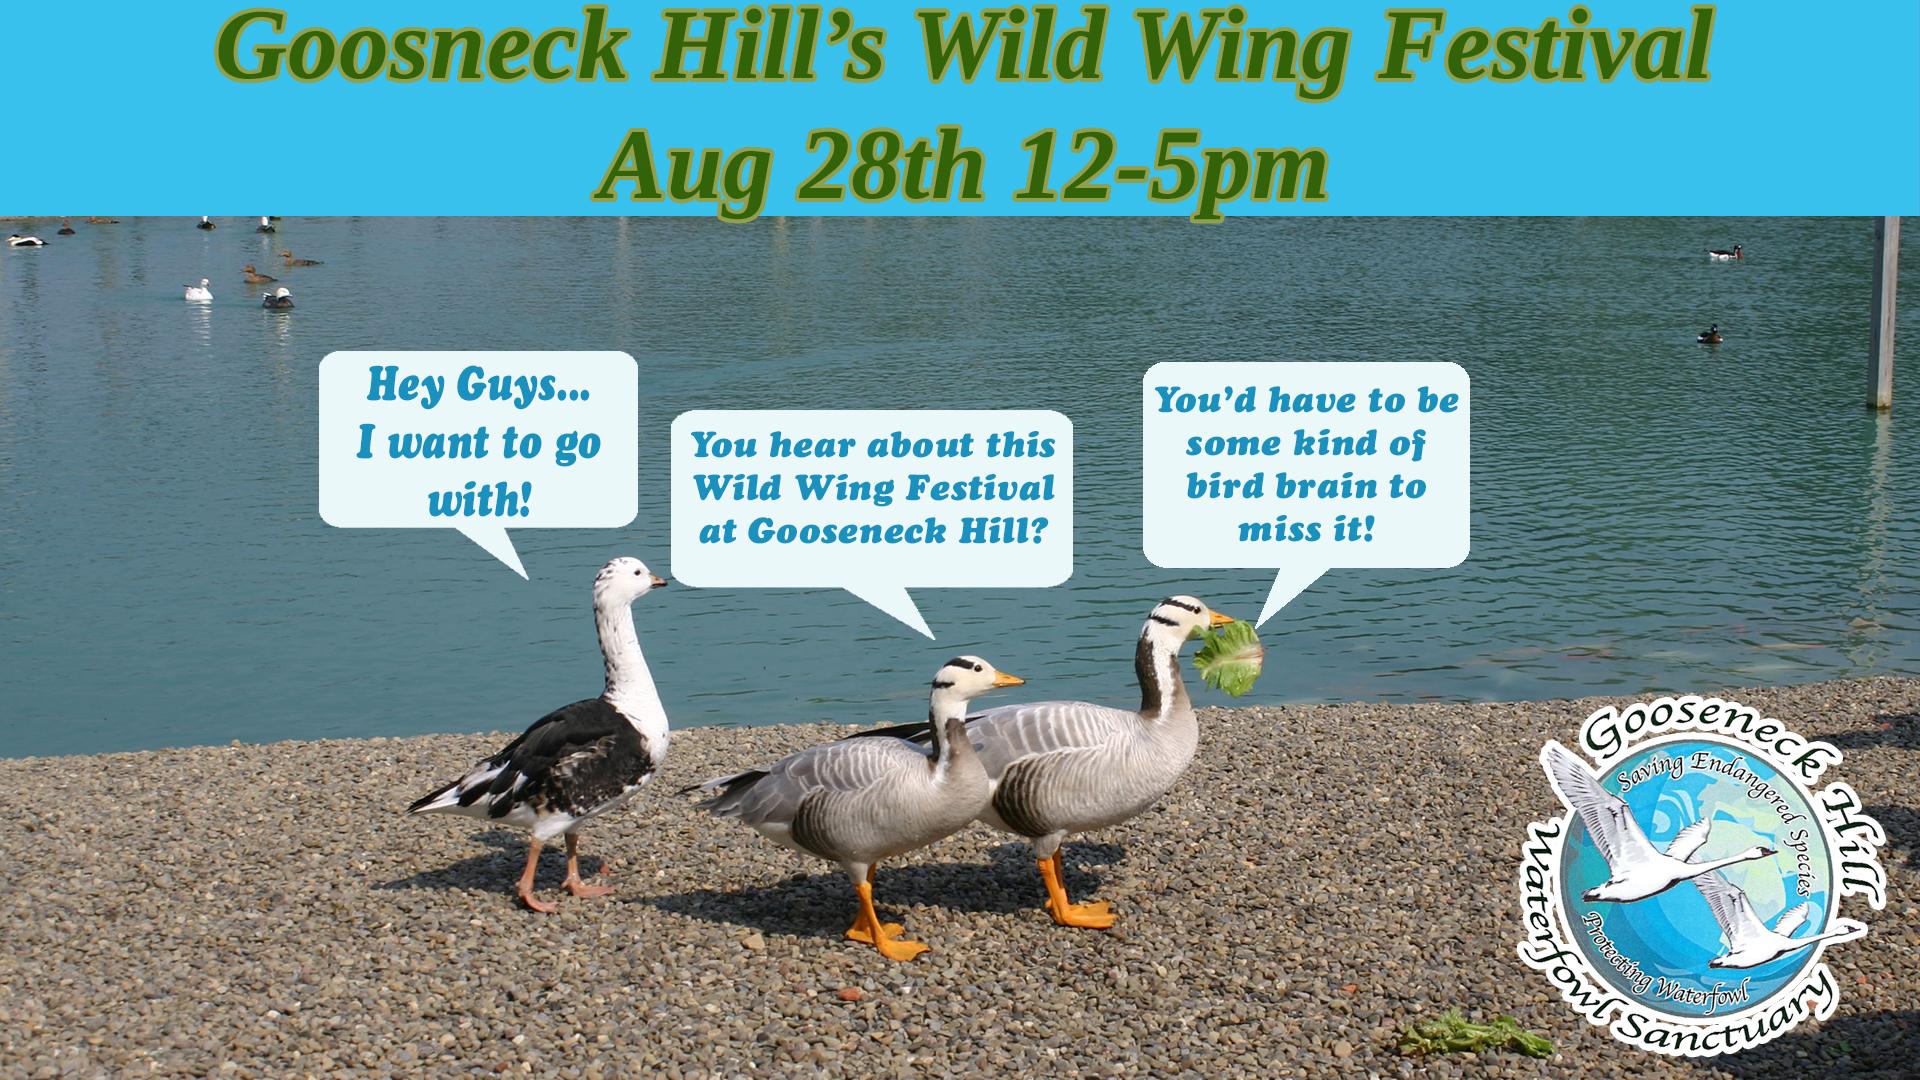 Wild Wing Festival at Gooseneck Hill